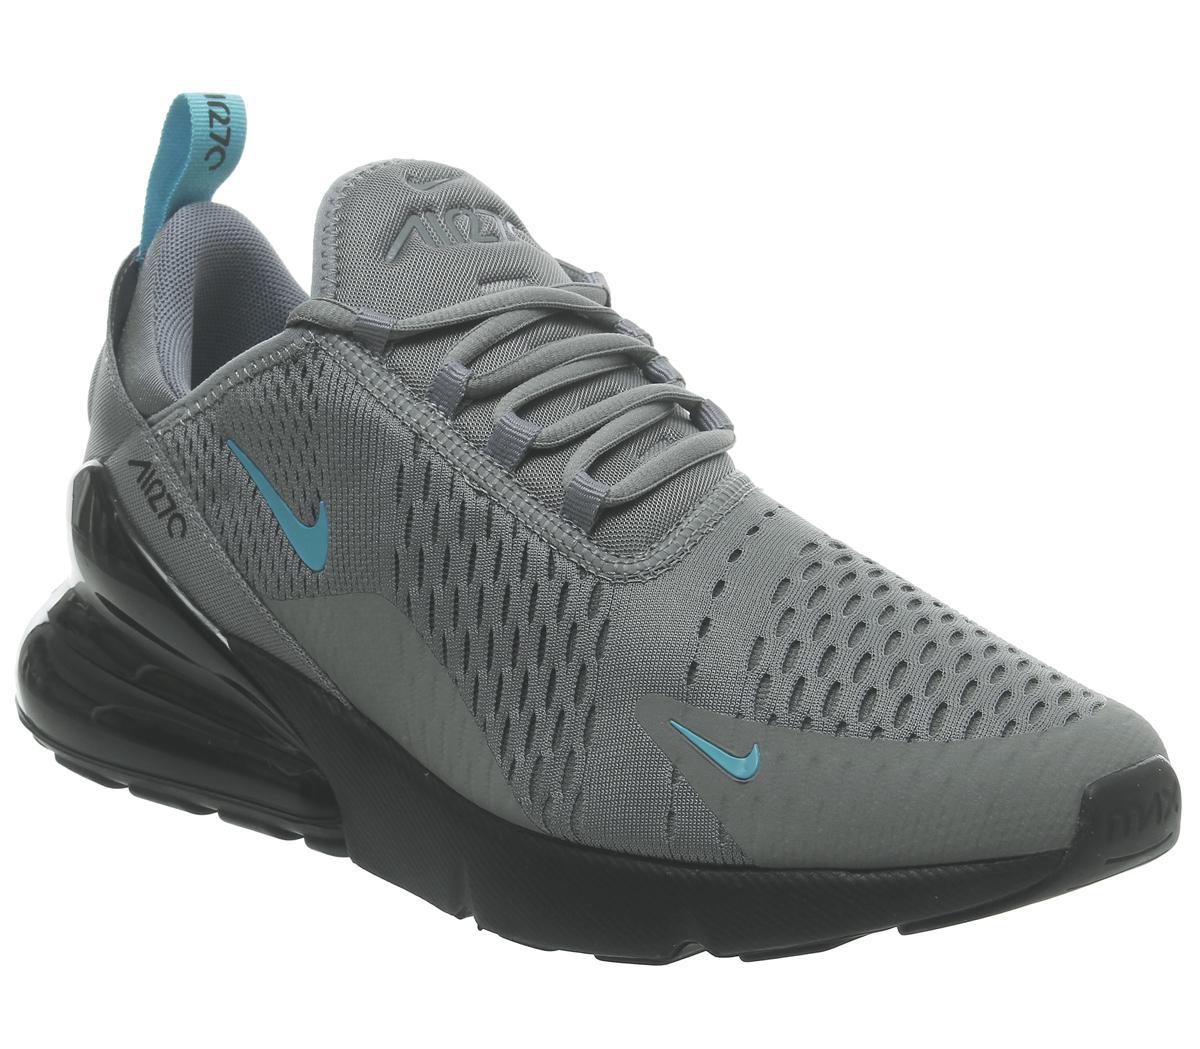 Nike Air Max 270 WE Cool Grey & Blue Fury | END.